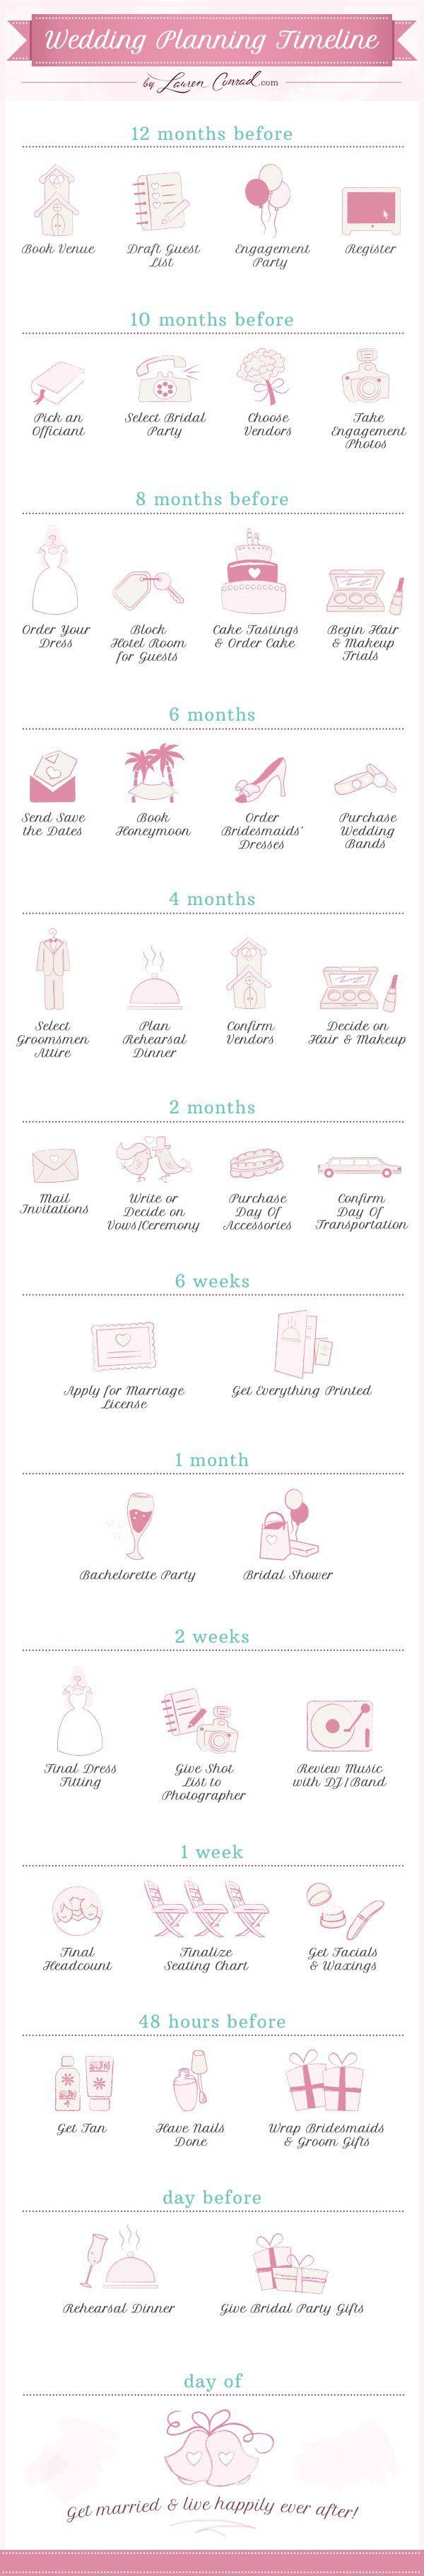 12 month wedding calendar.jpg